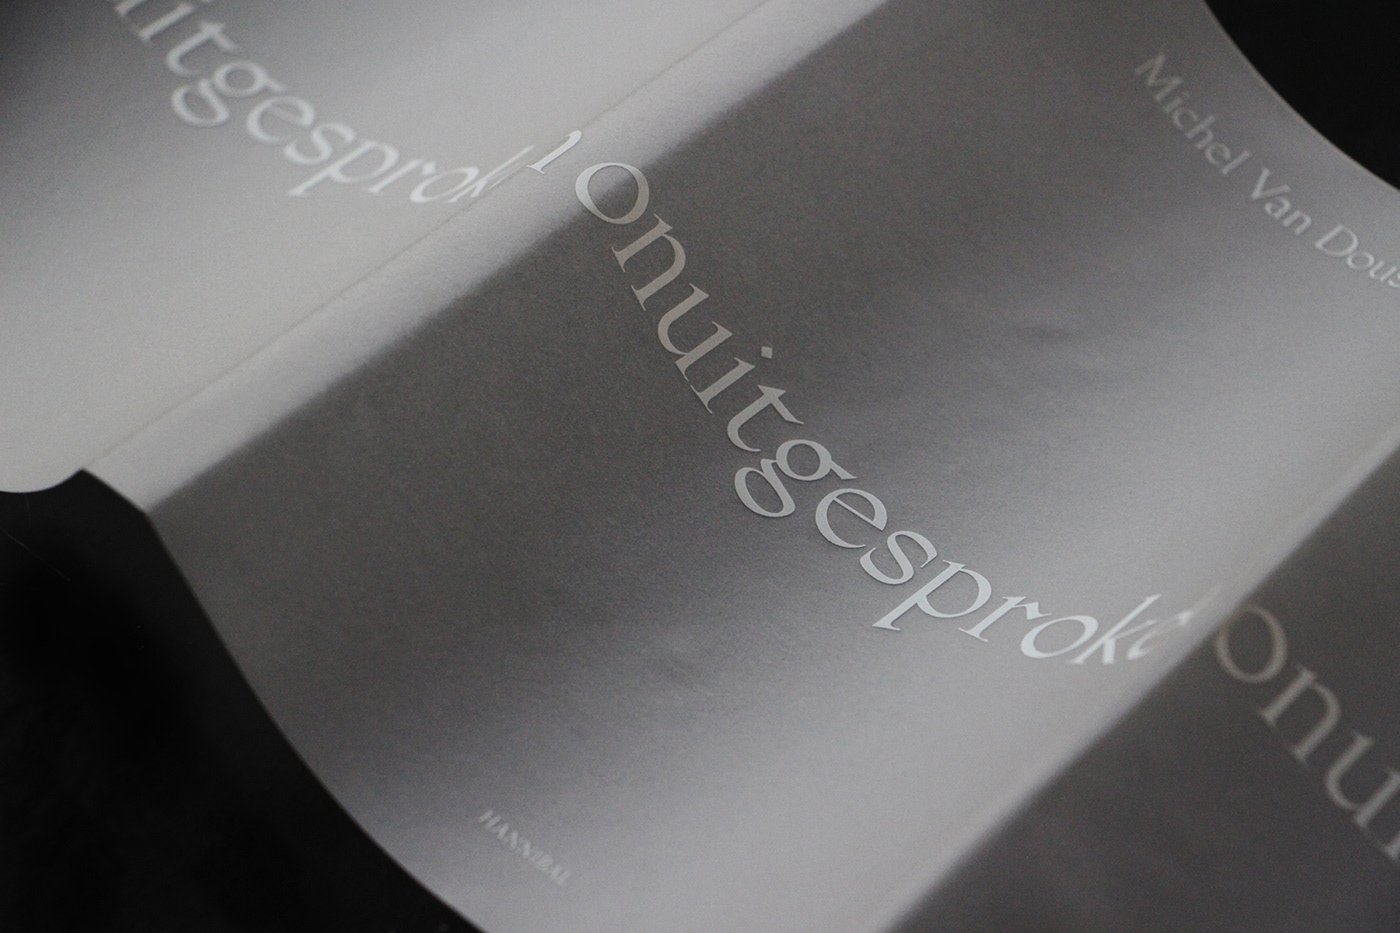 Michel Van Dousselaere,Theatre,book,Photography ,transparent,Transparency,black,actor,afasie